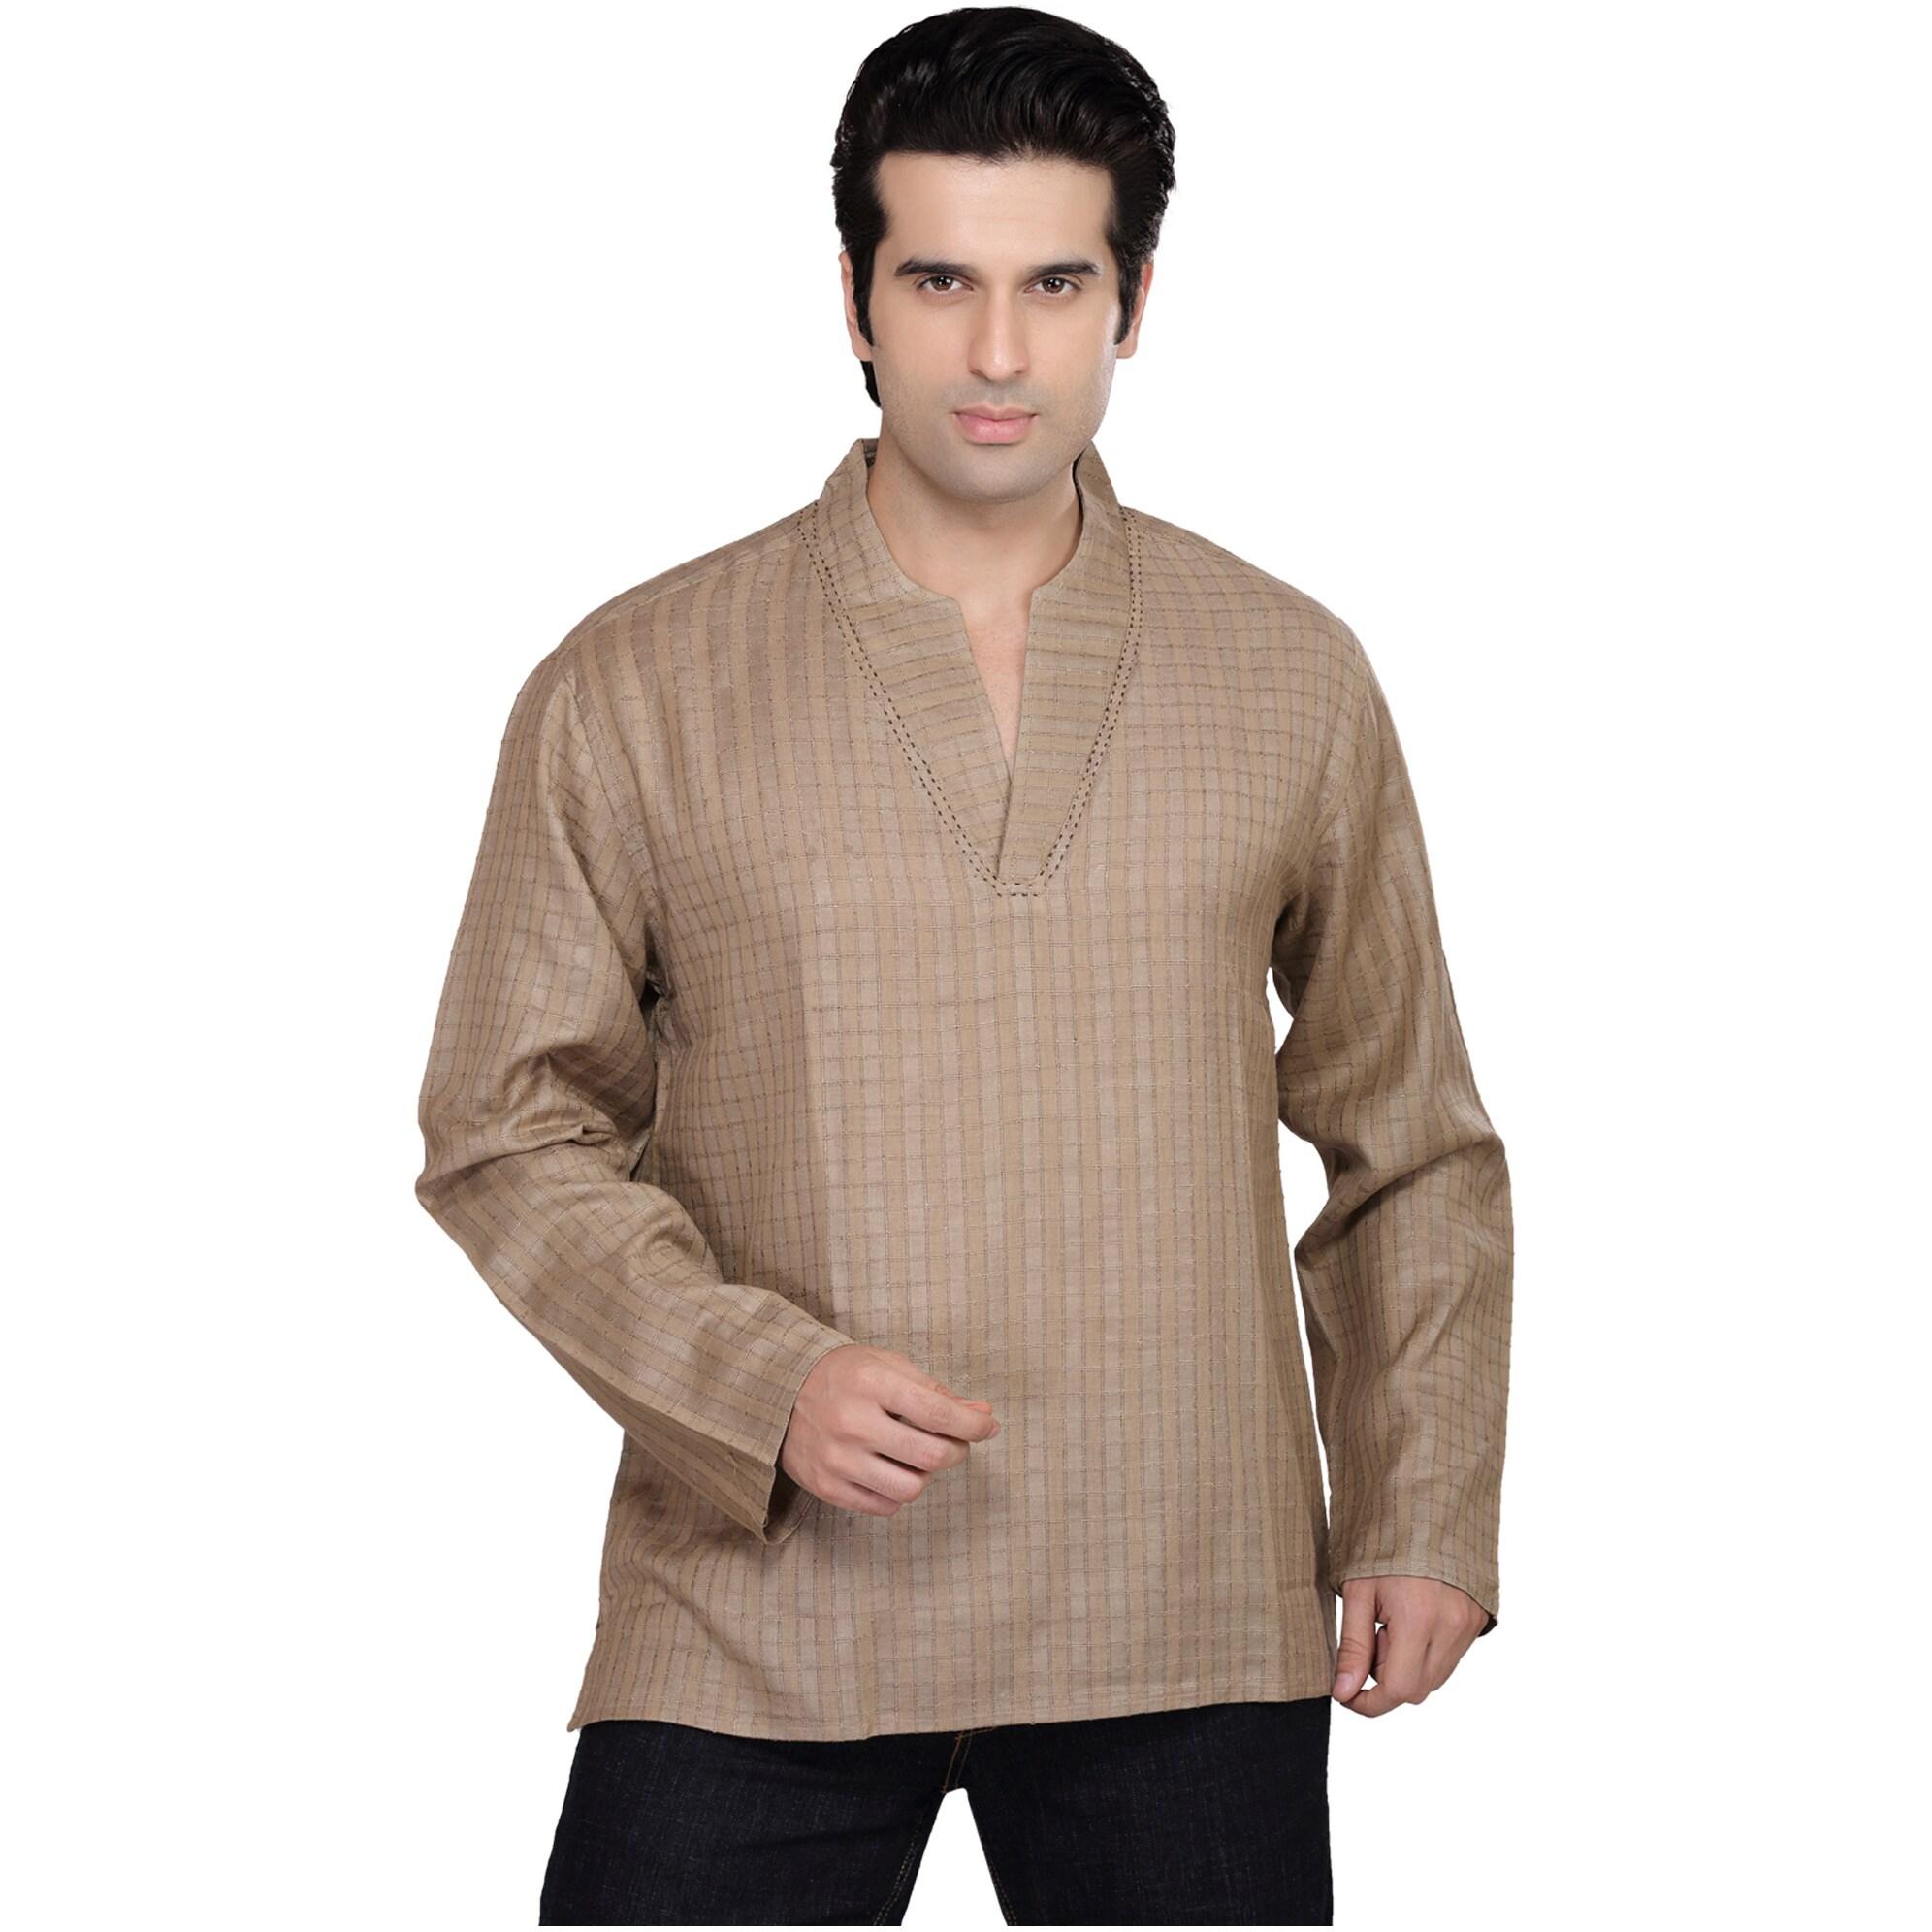 Handmade Shatranj Men's Kurta Tunic Checkered Shirt (Indi...